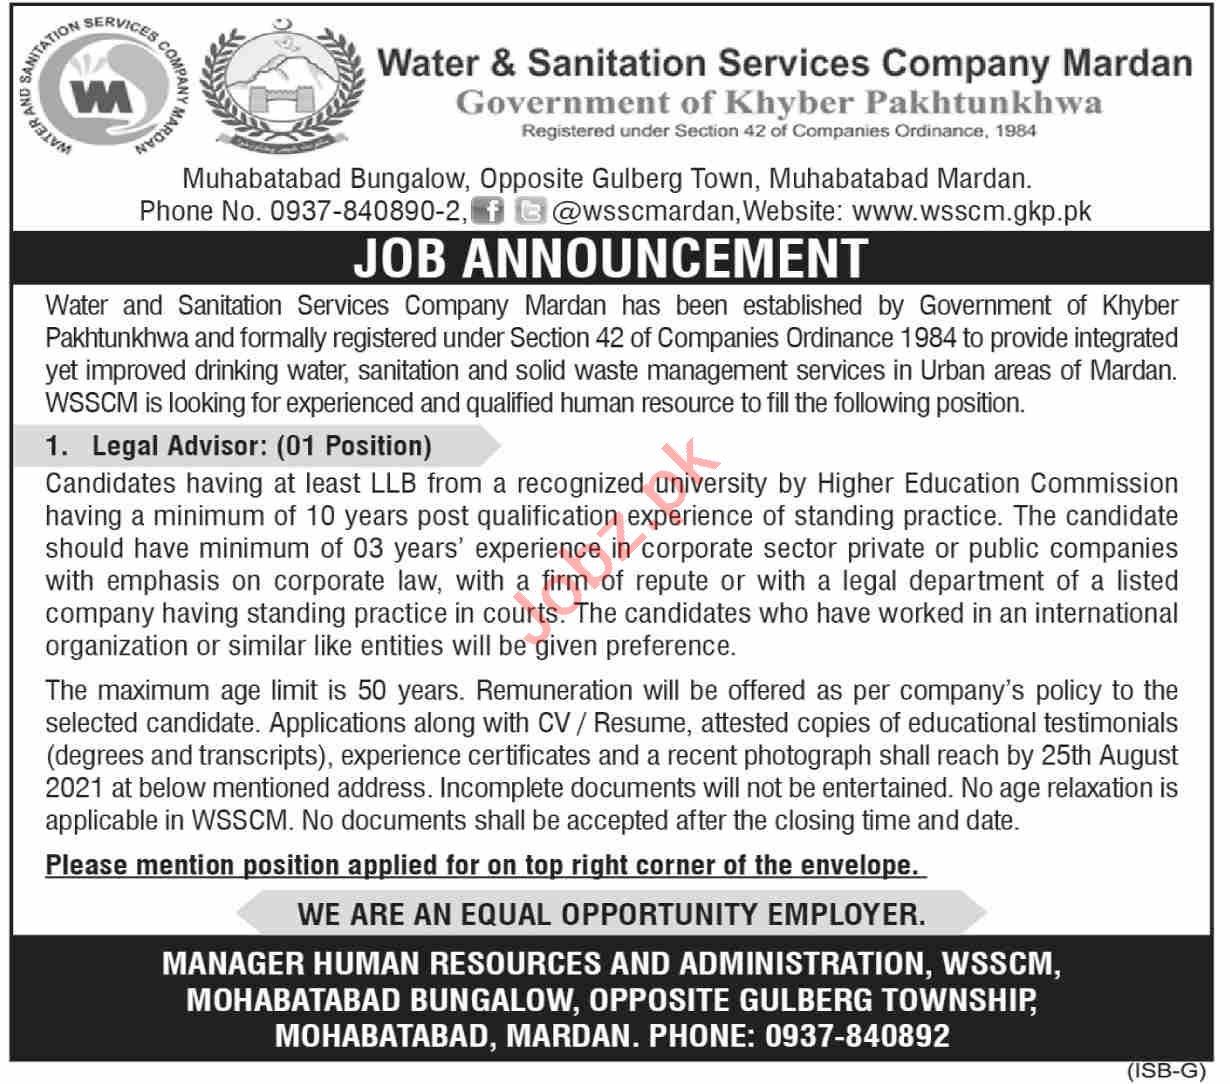 Water And Sanitation Services Company Mardan WSSCM Jobs 2021